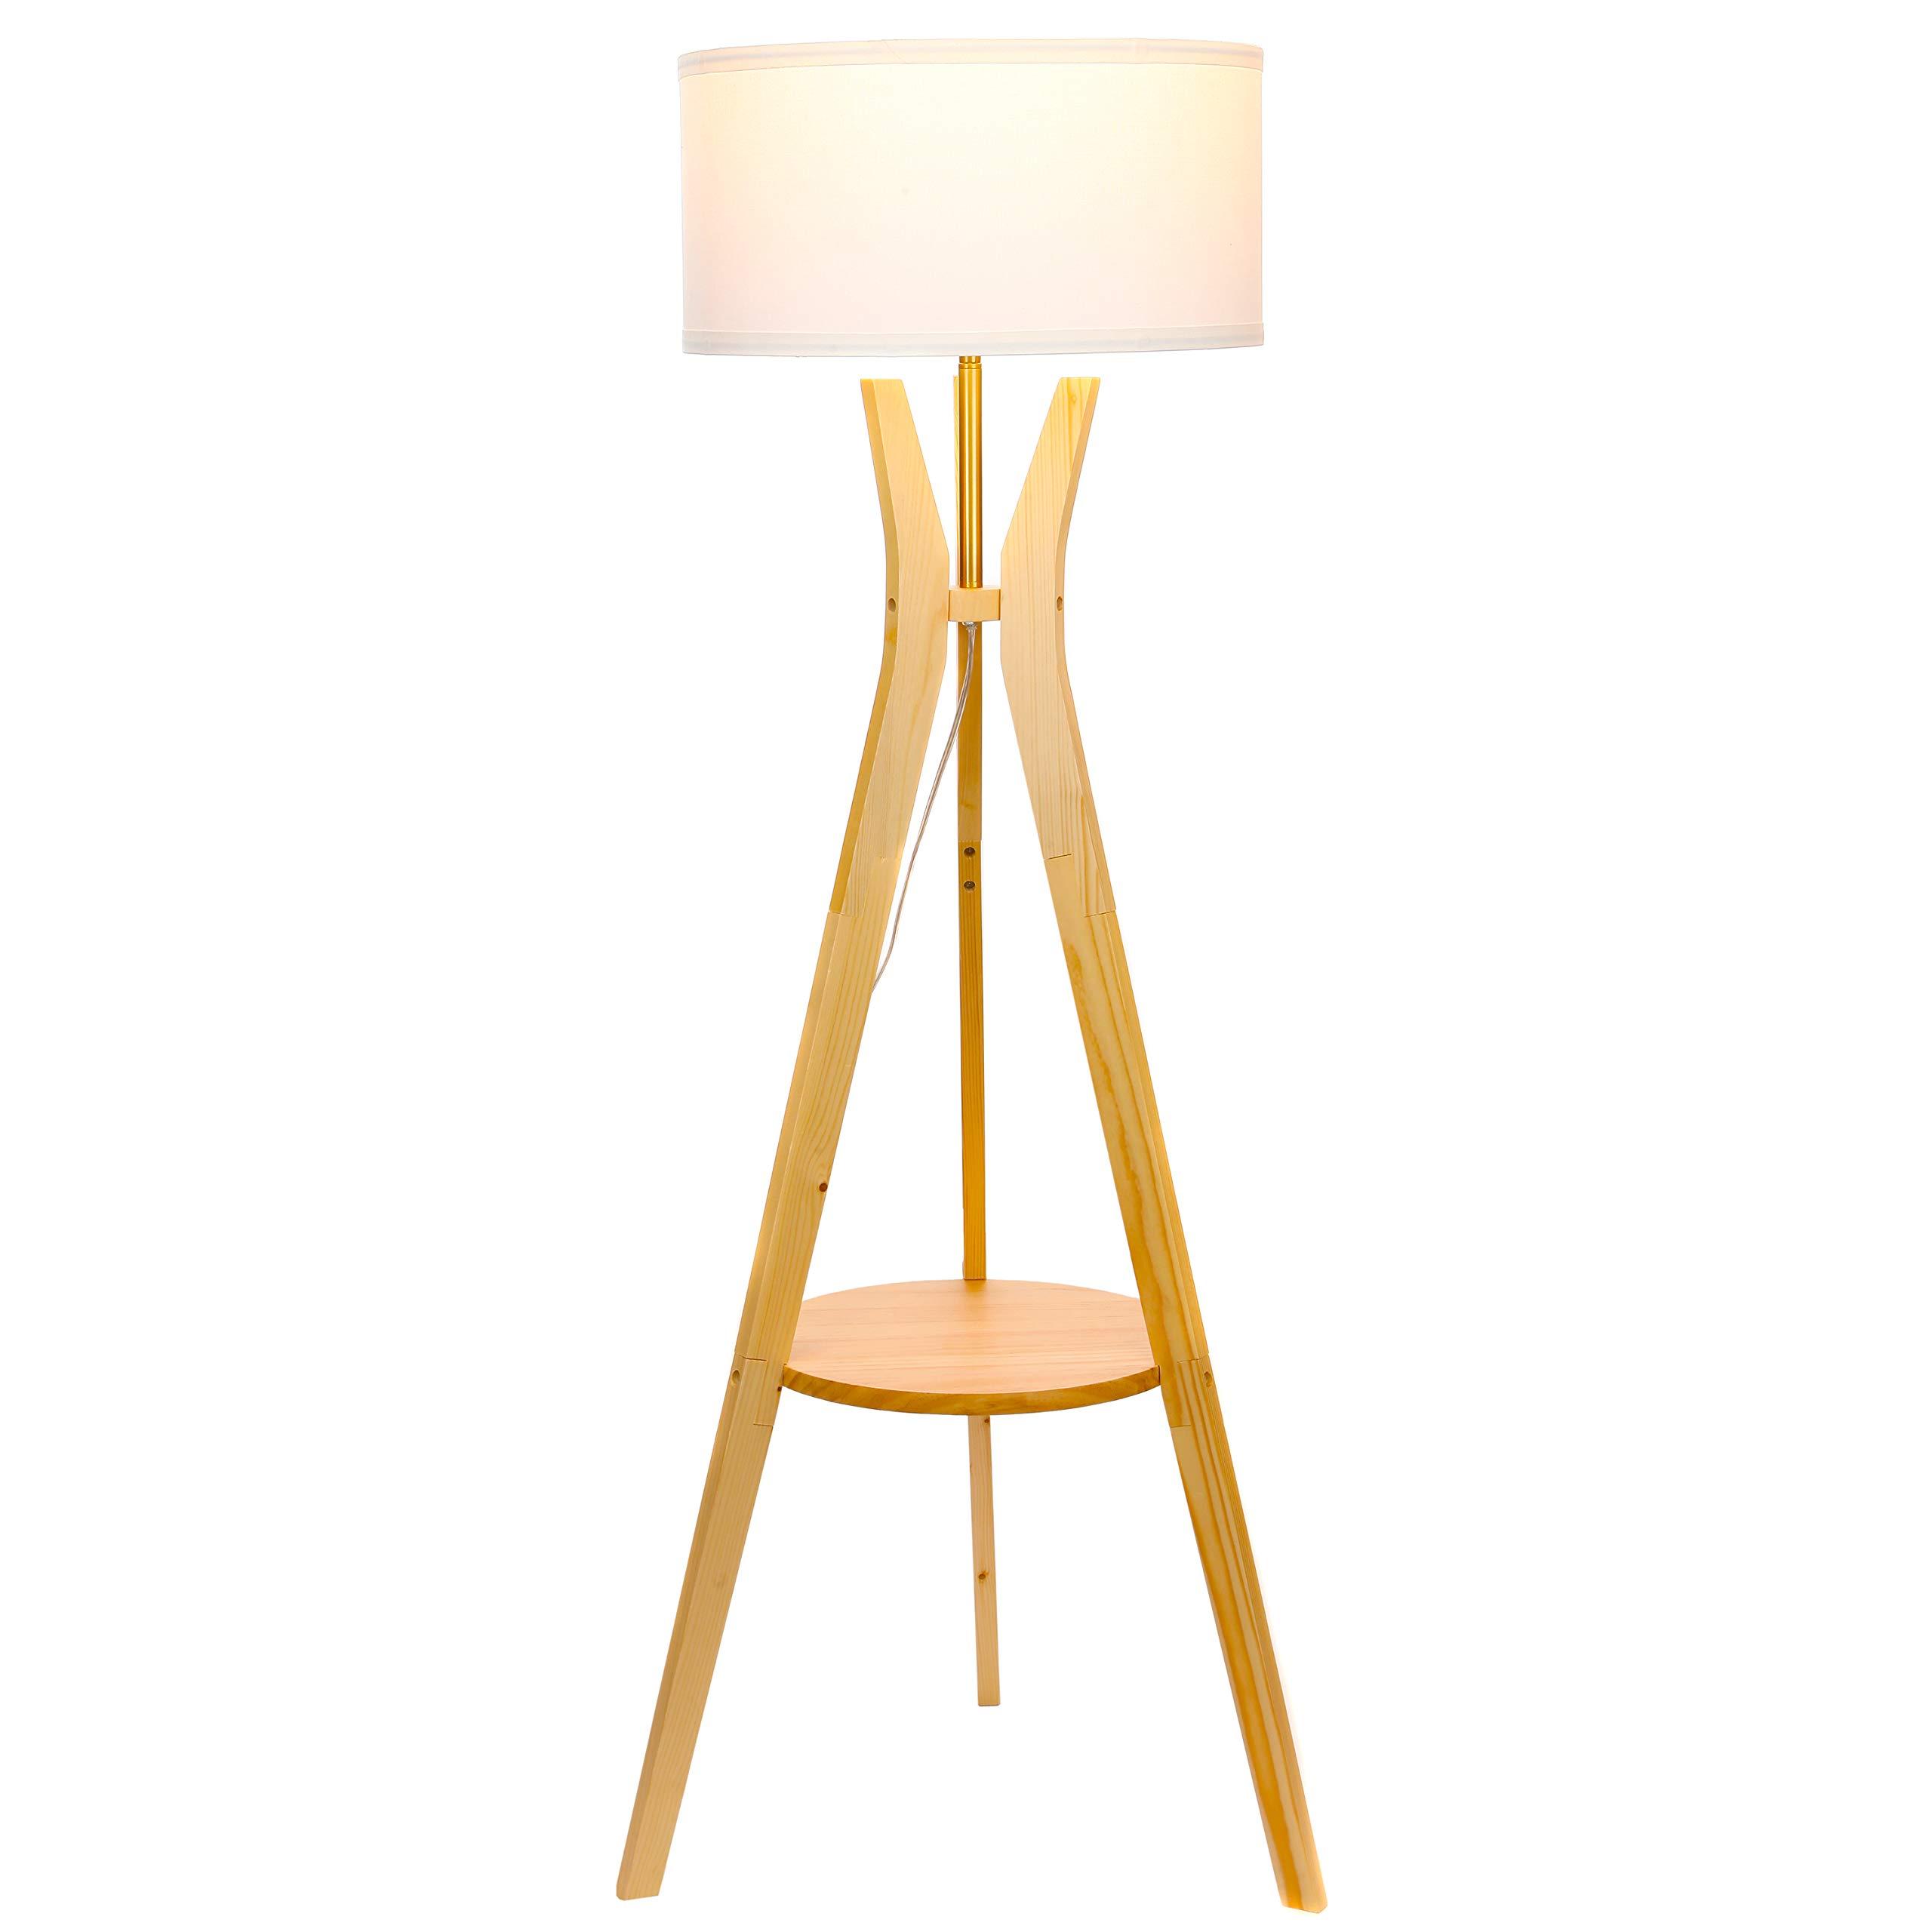 Brightech Charlotte LED Tripod Floor Lamp- Modern Design Standing Light with Shelf for Living Room, Bedrooms, Office, Den, Dorm- Classic Drum Shade – Natural Wood